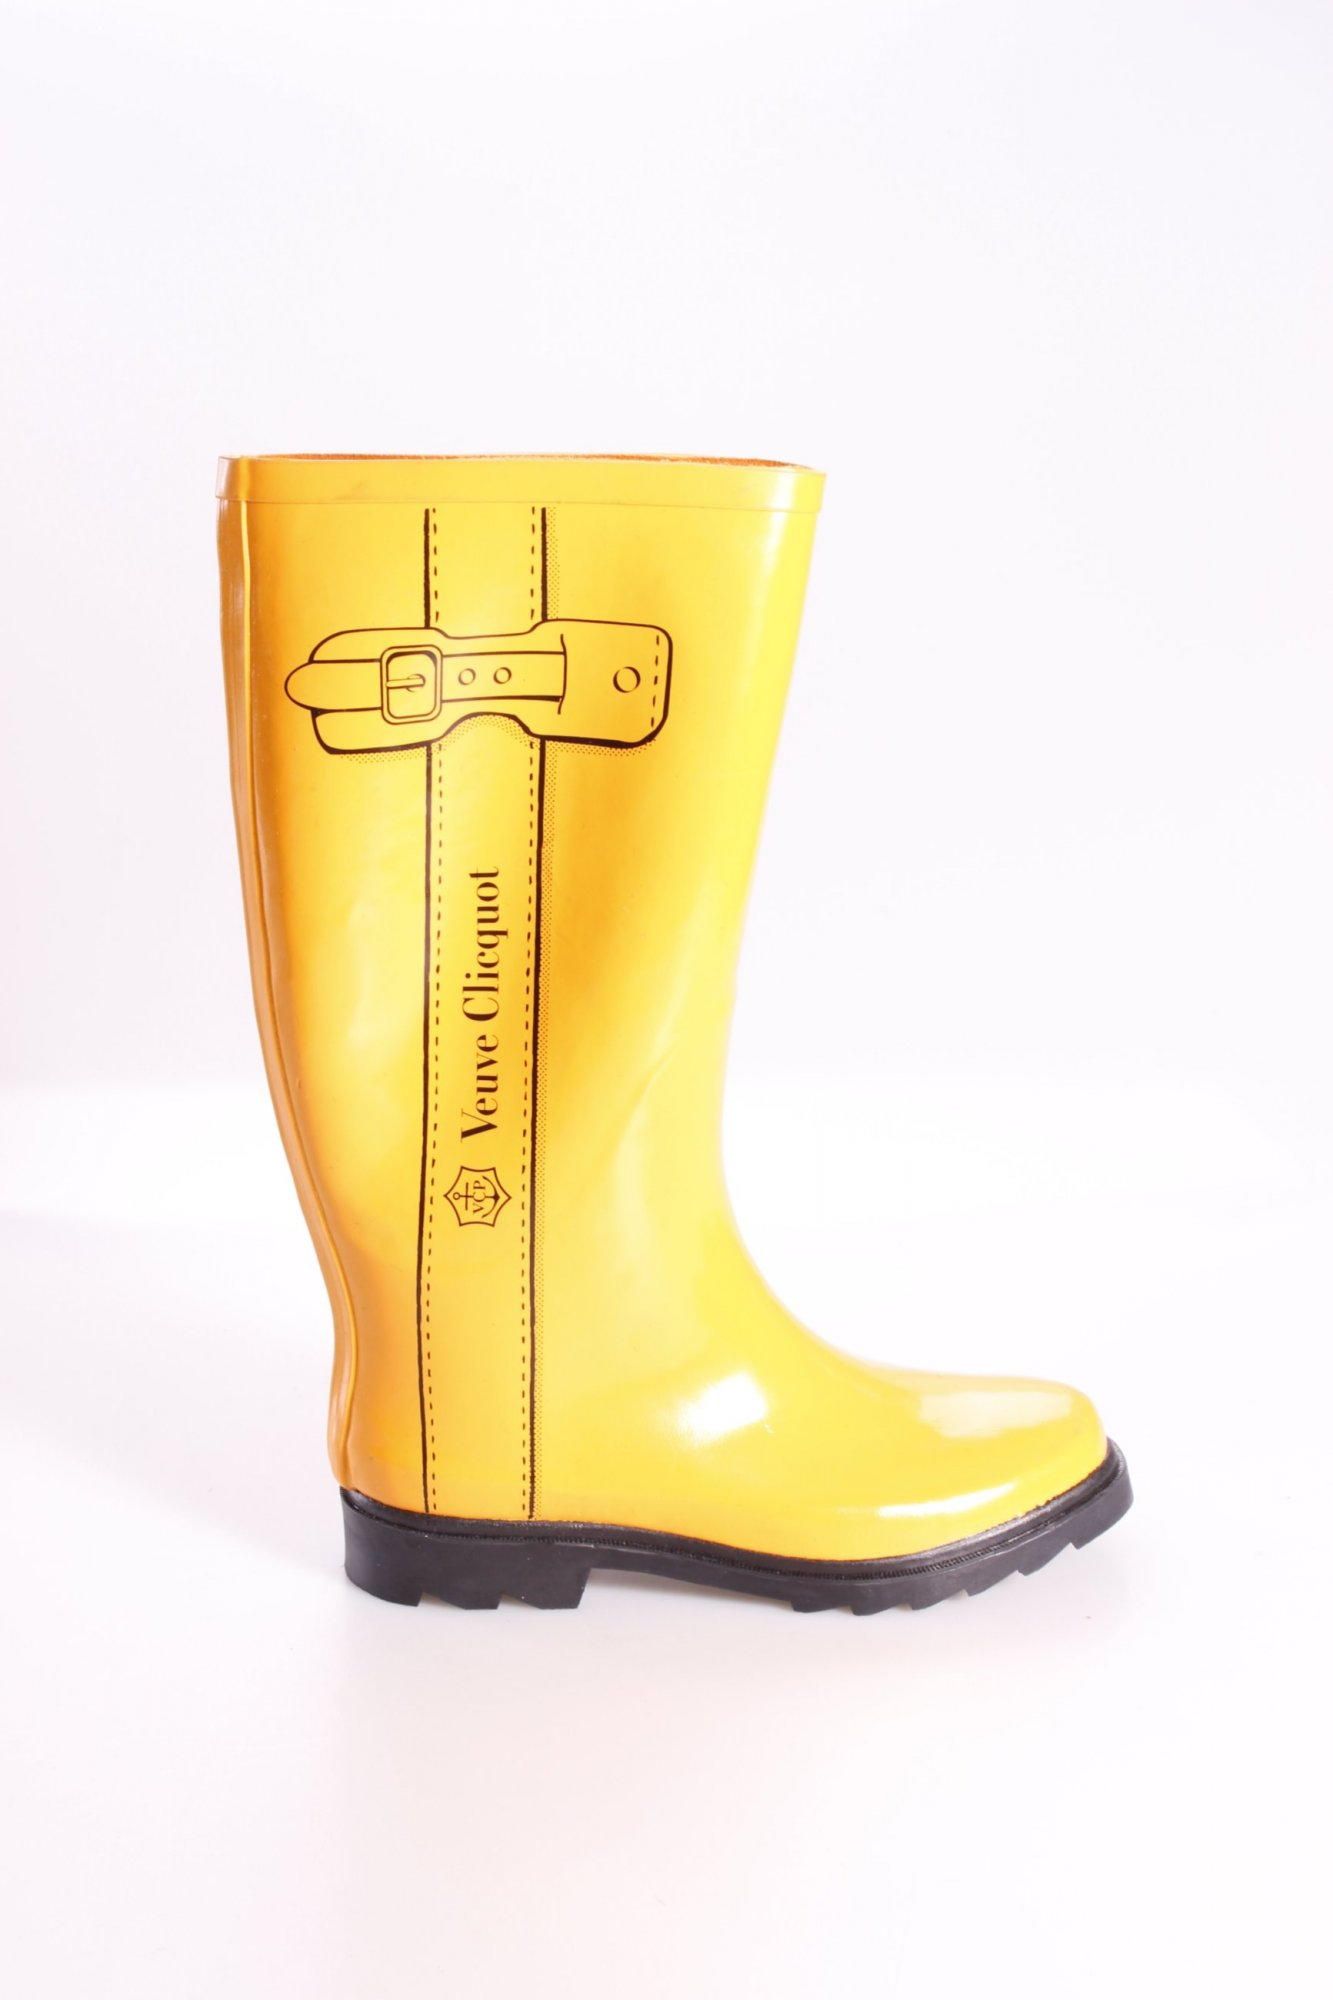 veuve clicquot gummistiefel gelb damen gr de 42 dunkelgelb stiefel high boots ebay. Black Bedroom Furniture Sets. Home Design Ideas